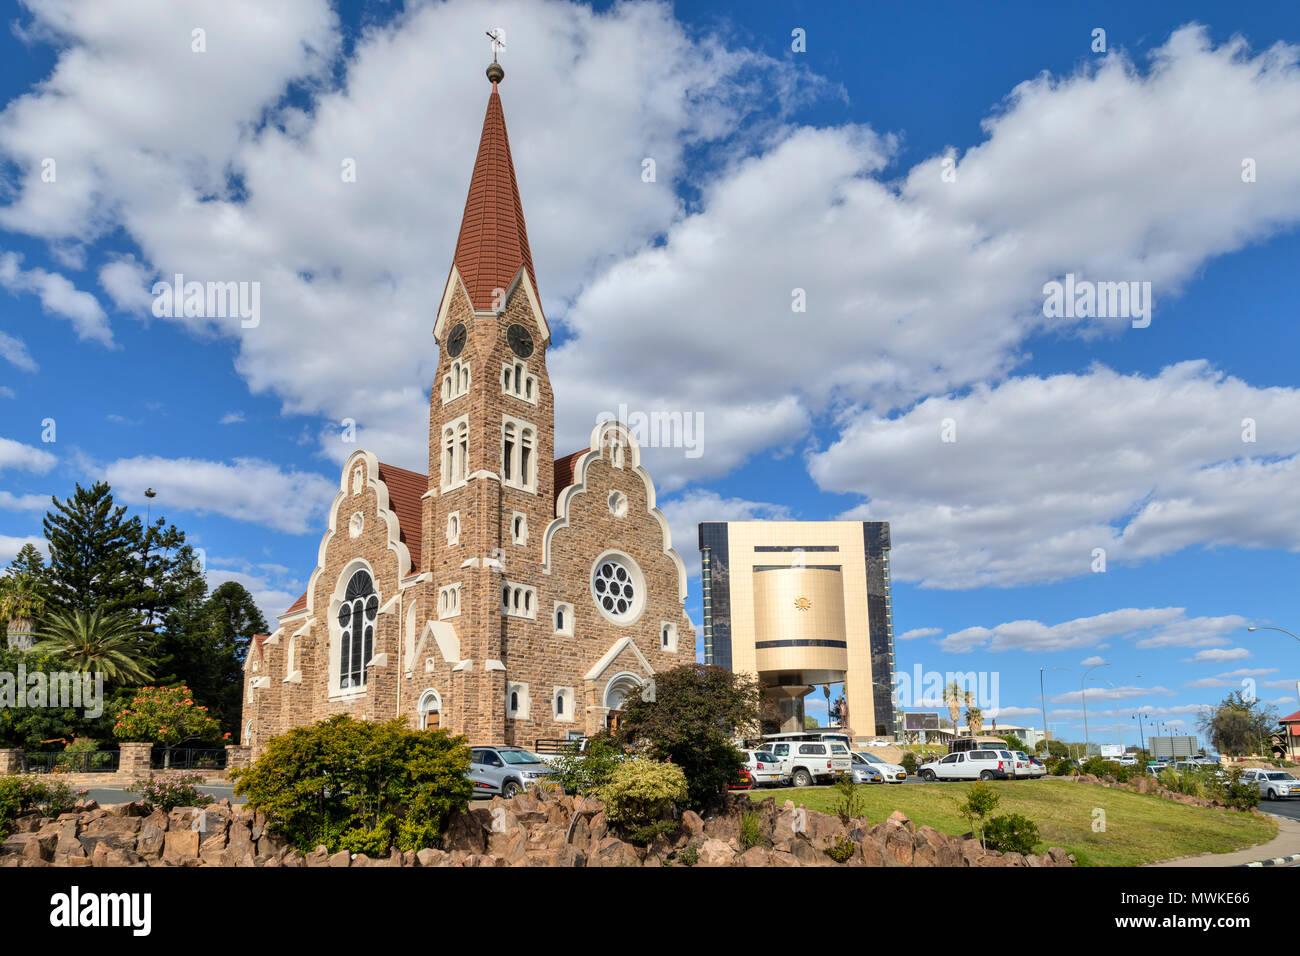 Windhoek, Christuskirche, Namibia, Africa - Stock Image